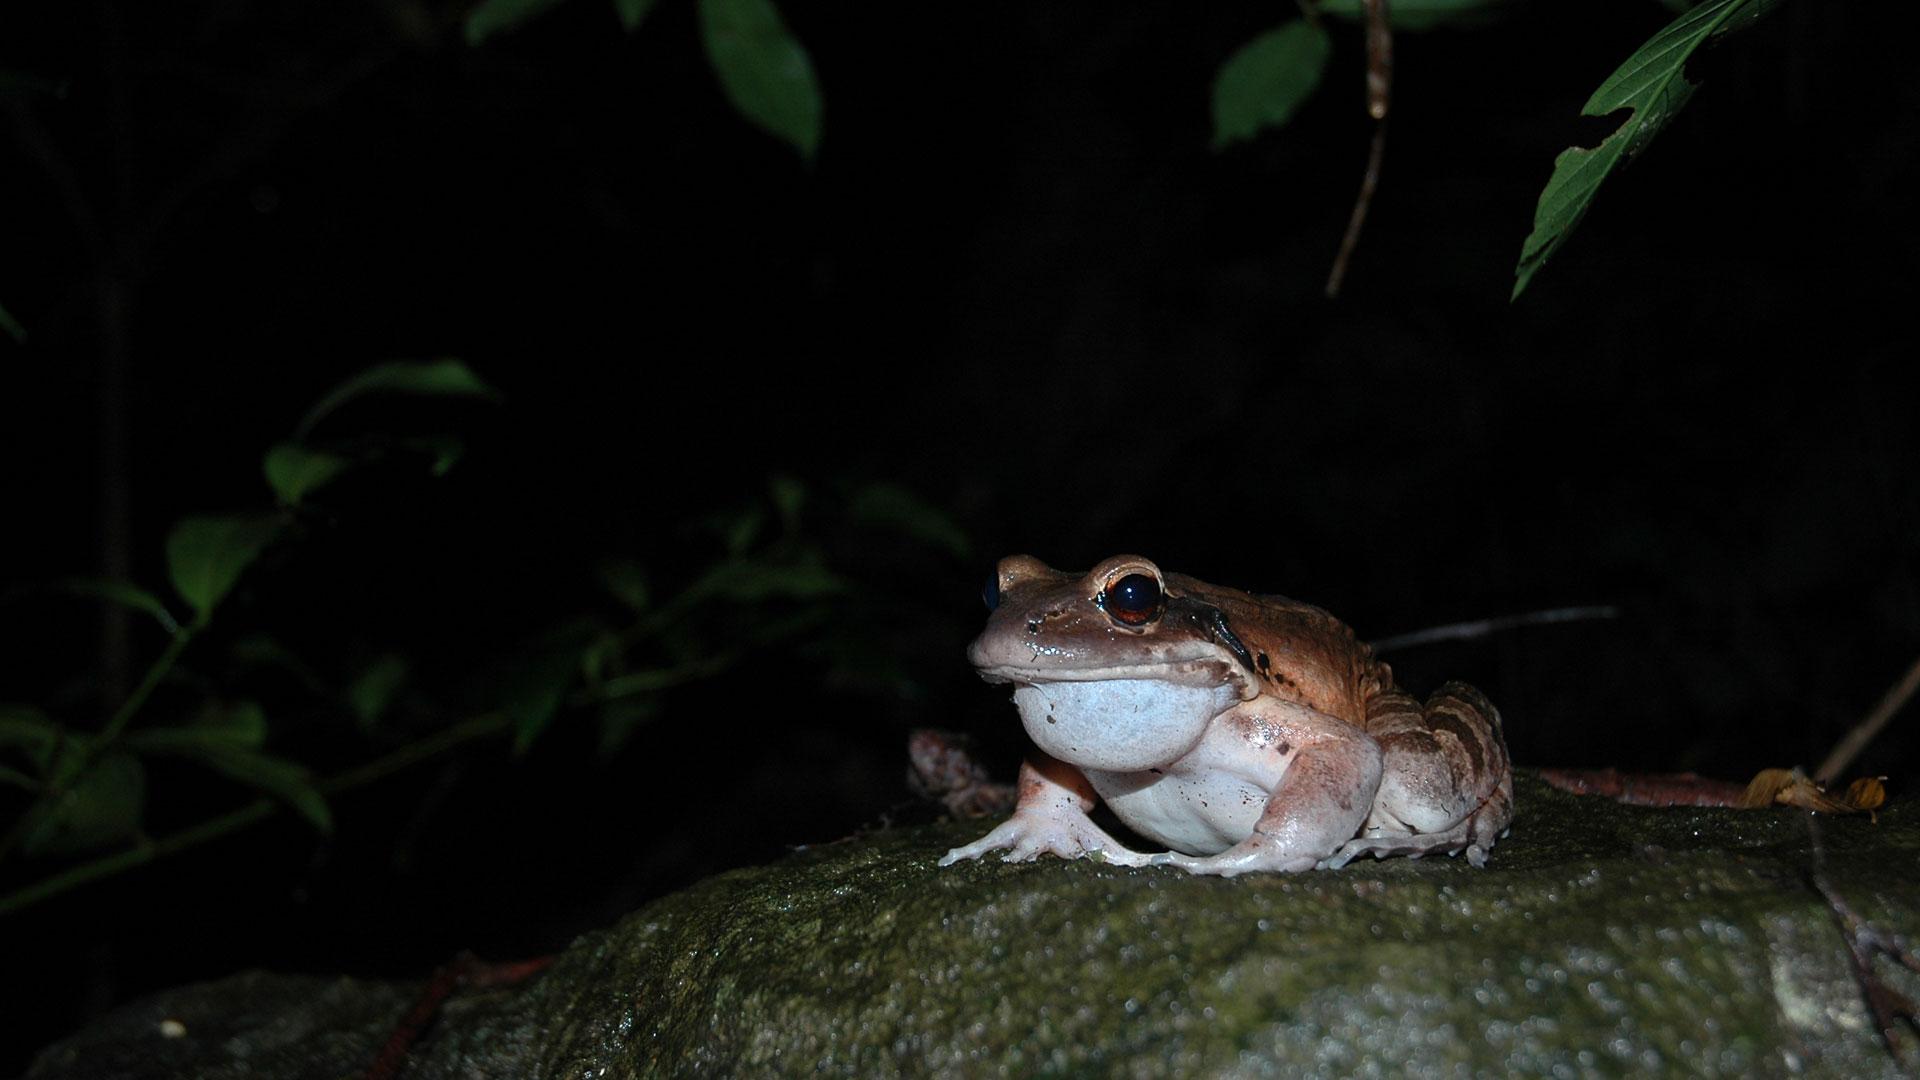 https://rfacdn.nz/zoo/assets/media/mountain-chicken-frog-gallery-11.jpg